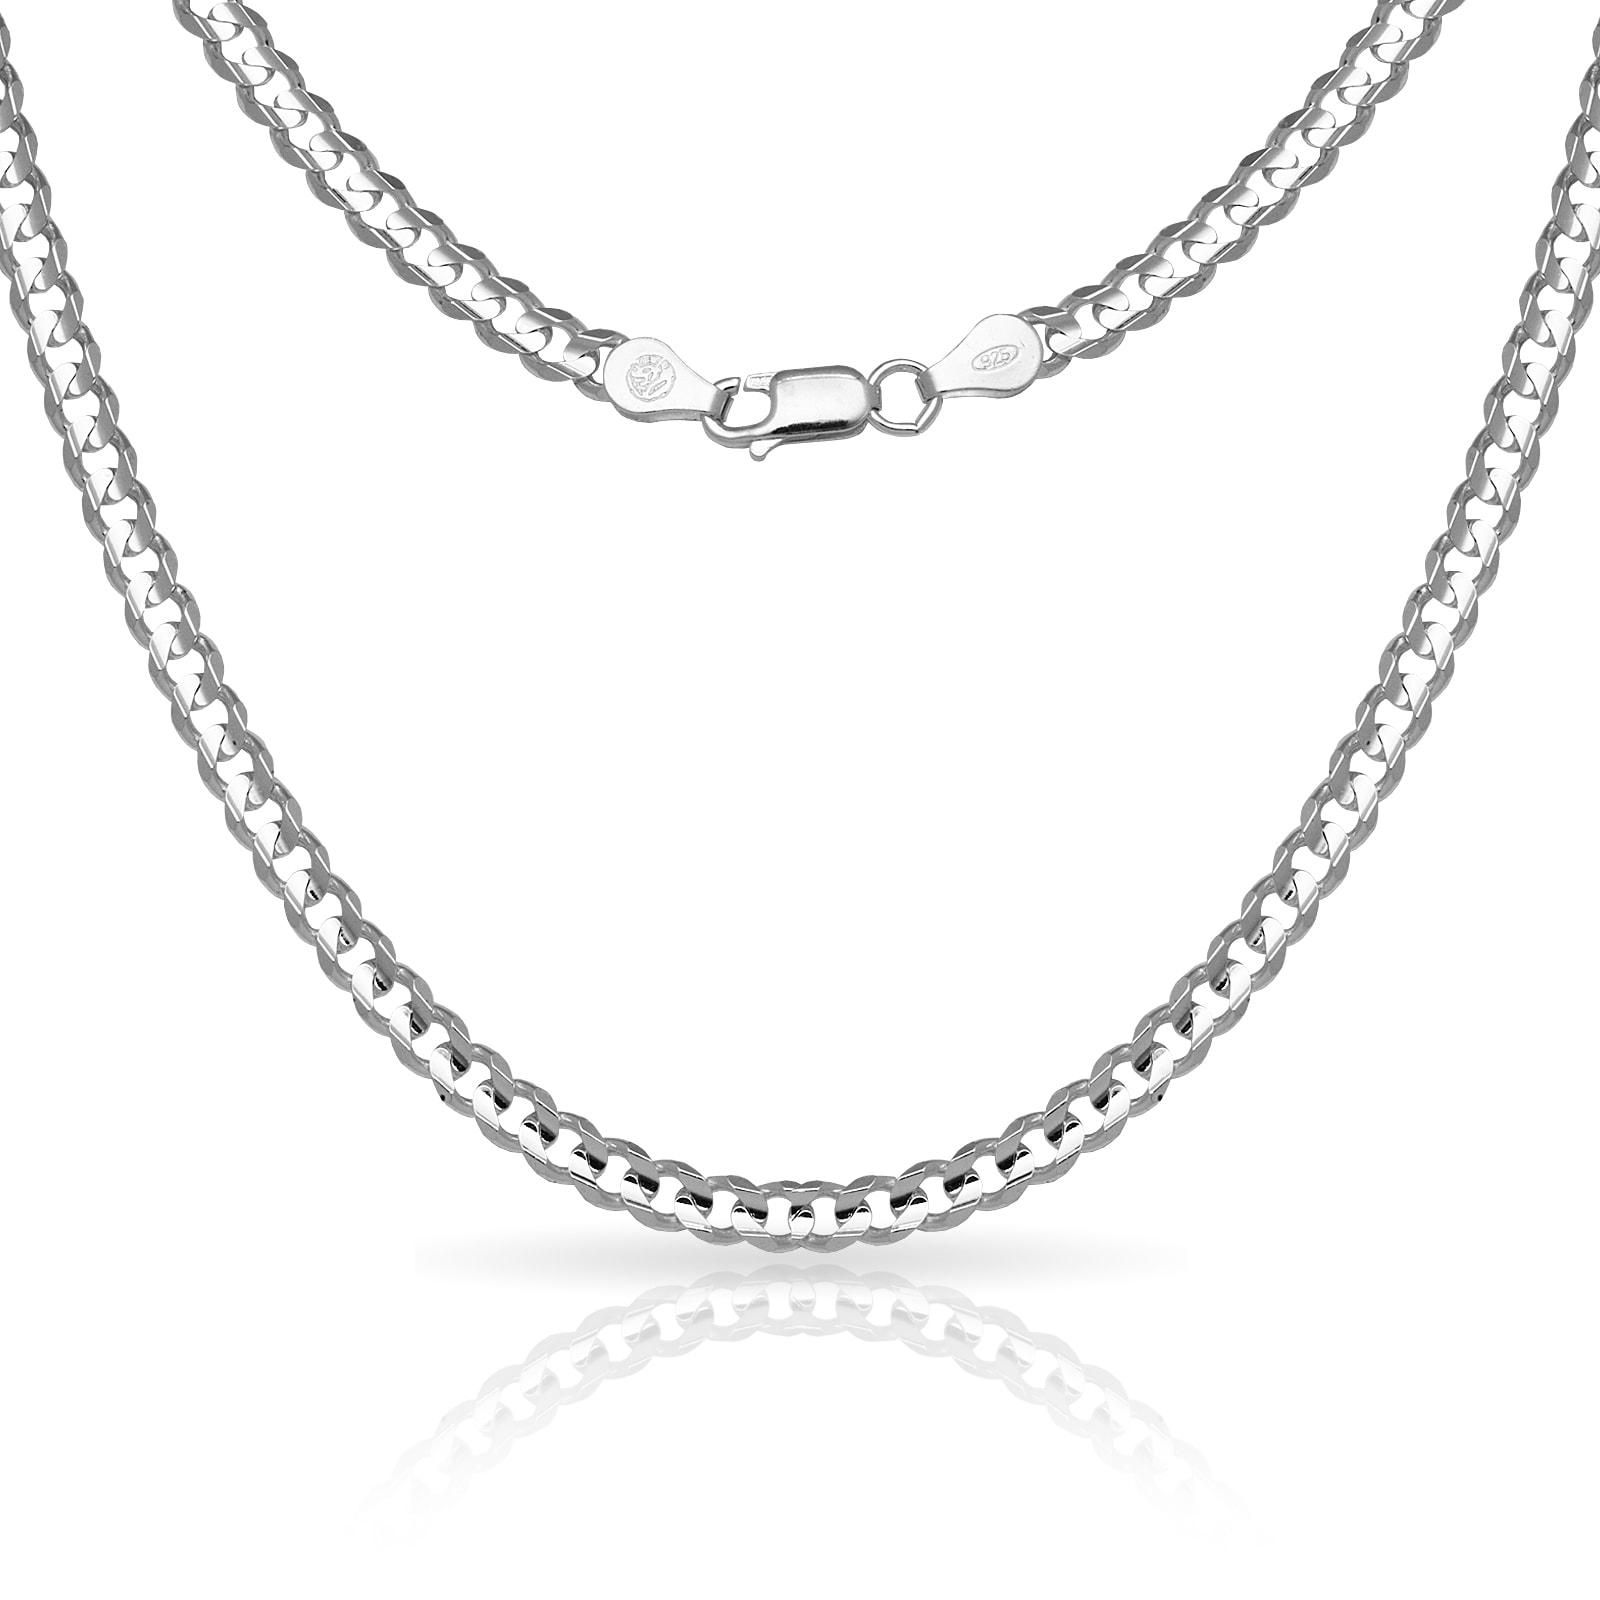 CL15 925 Sterling Silver British Made Mens Plain Cufflinks